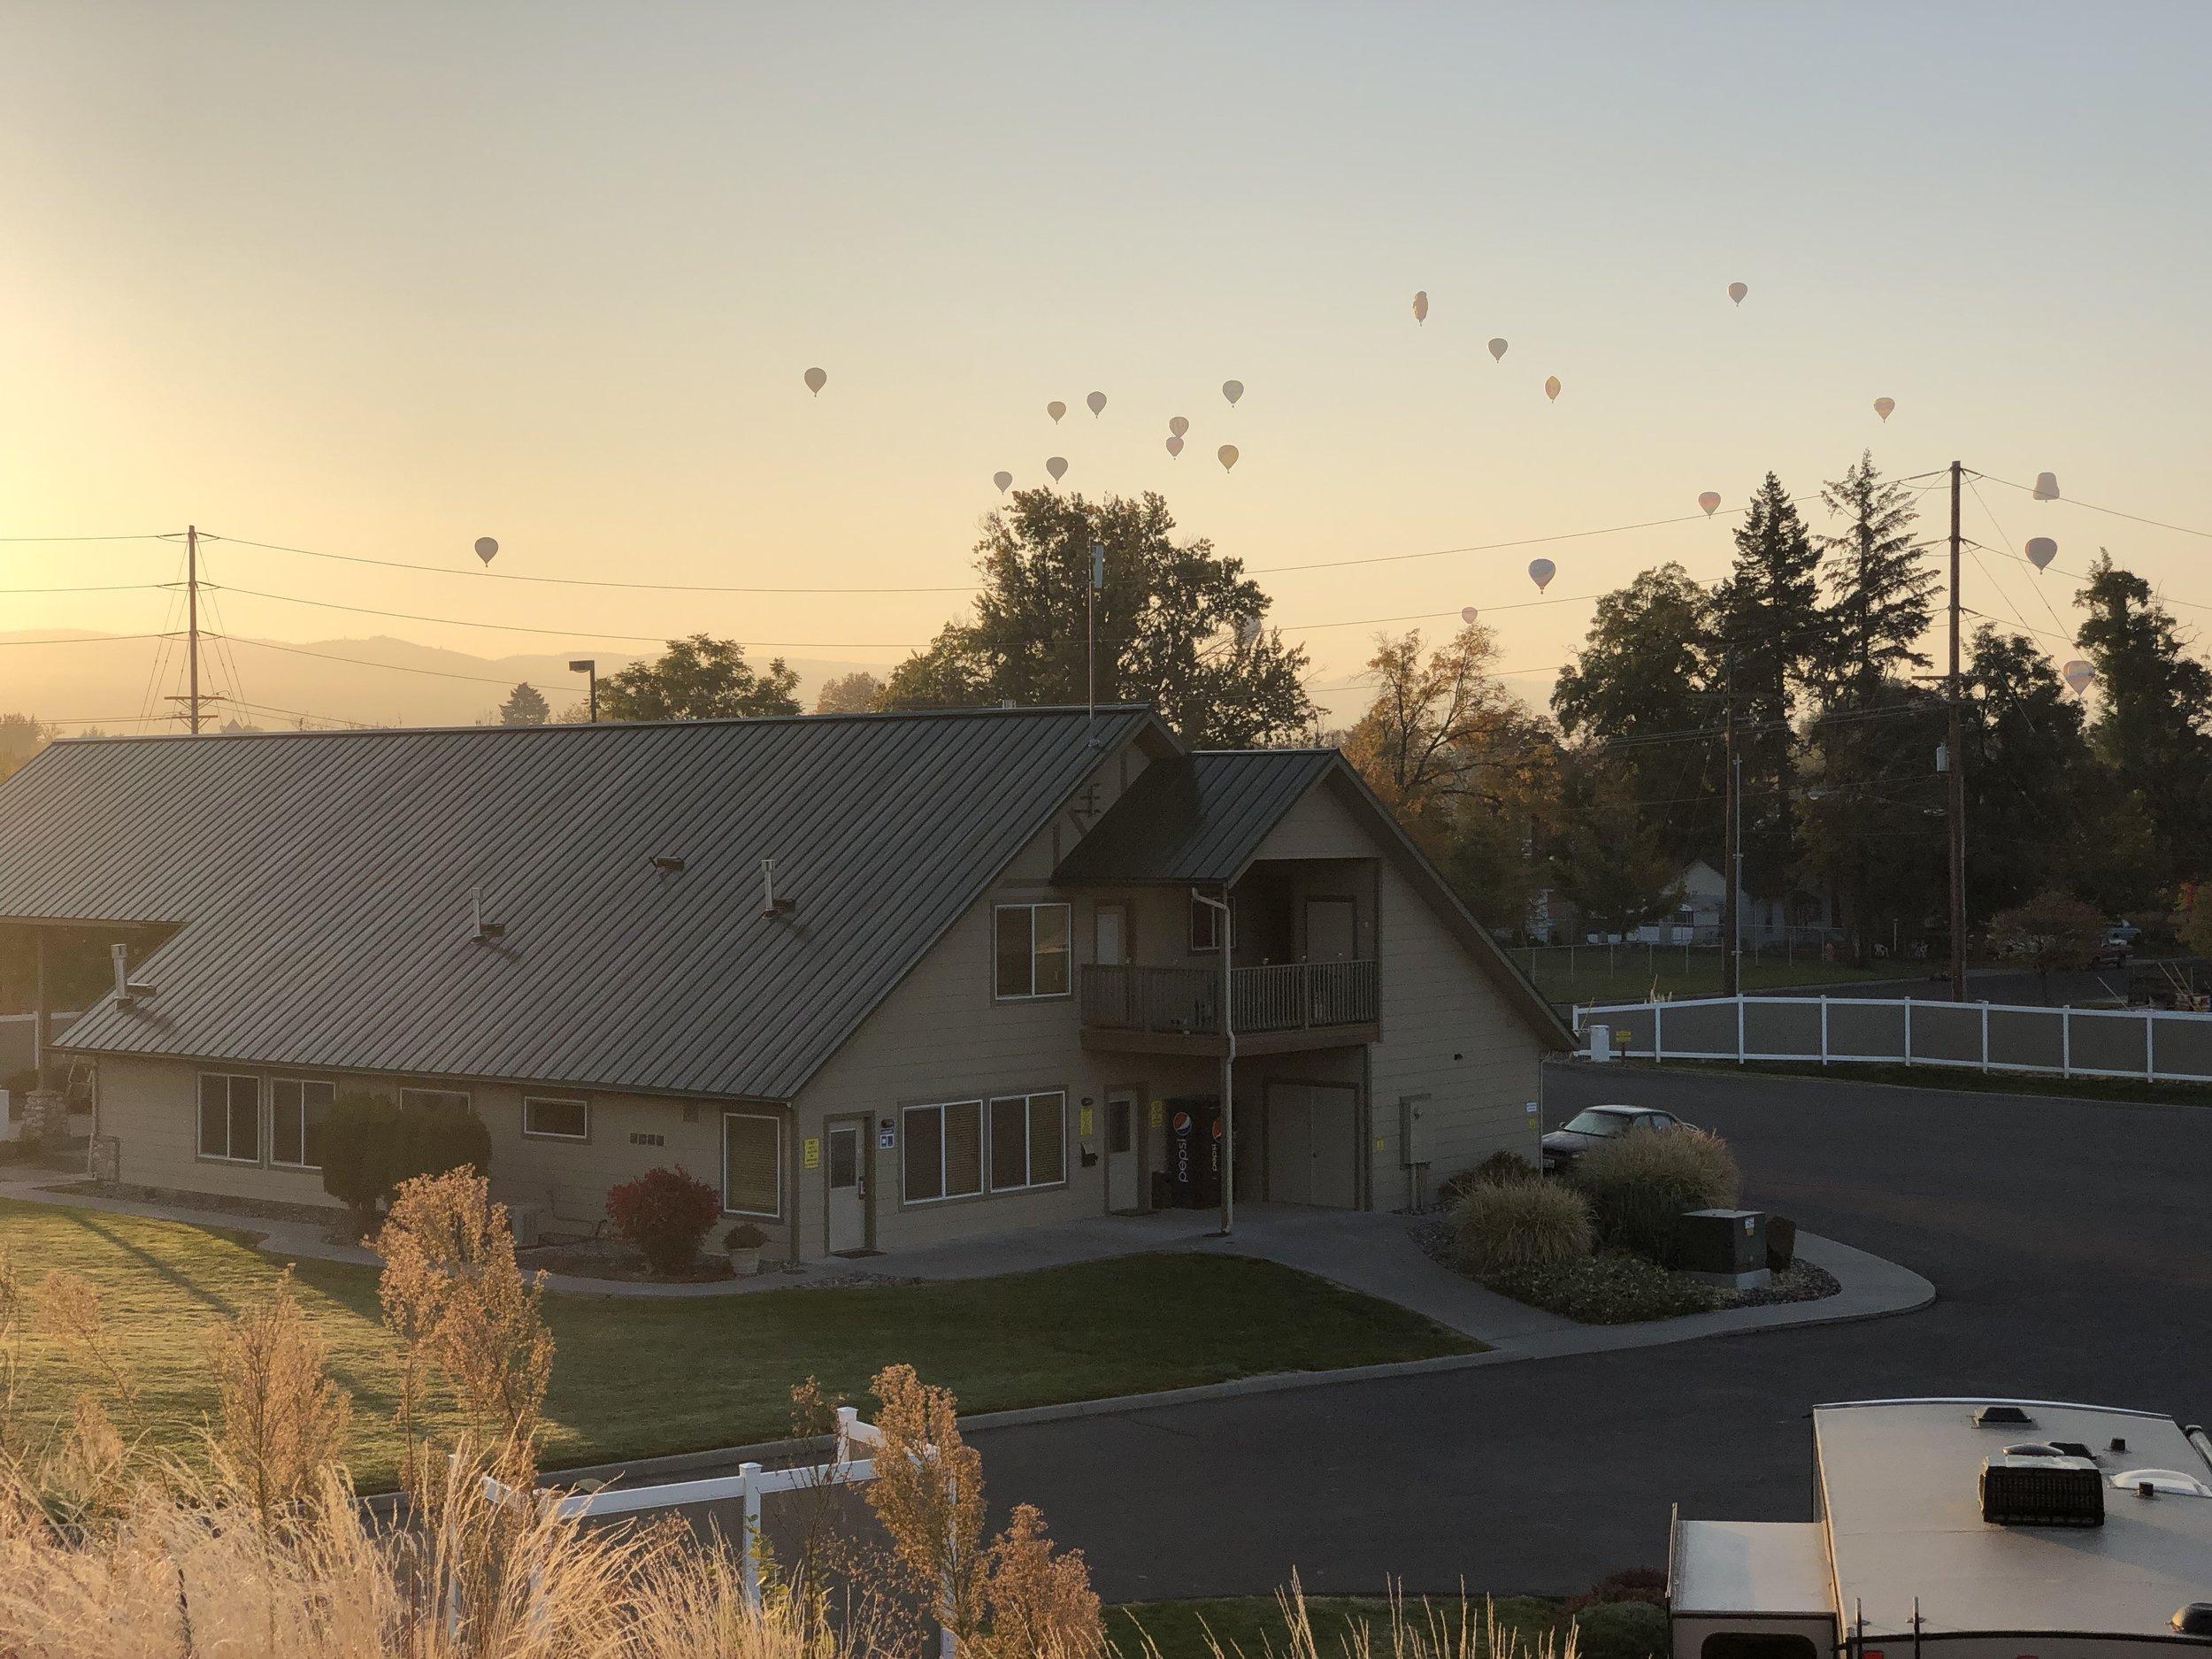 2018 Baloons (16).JPG